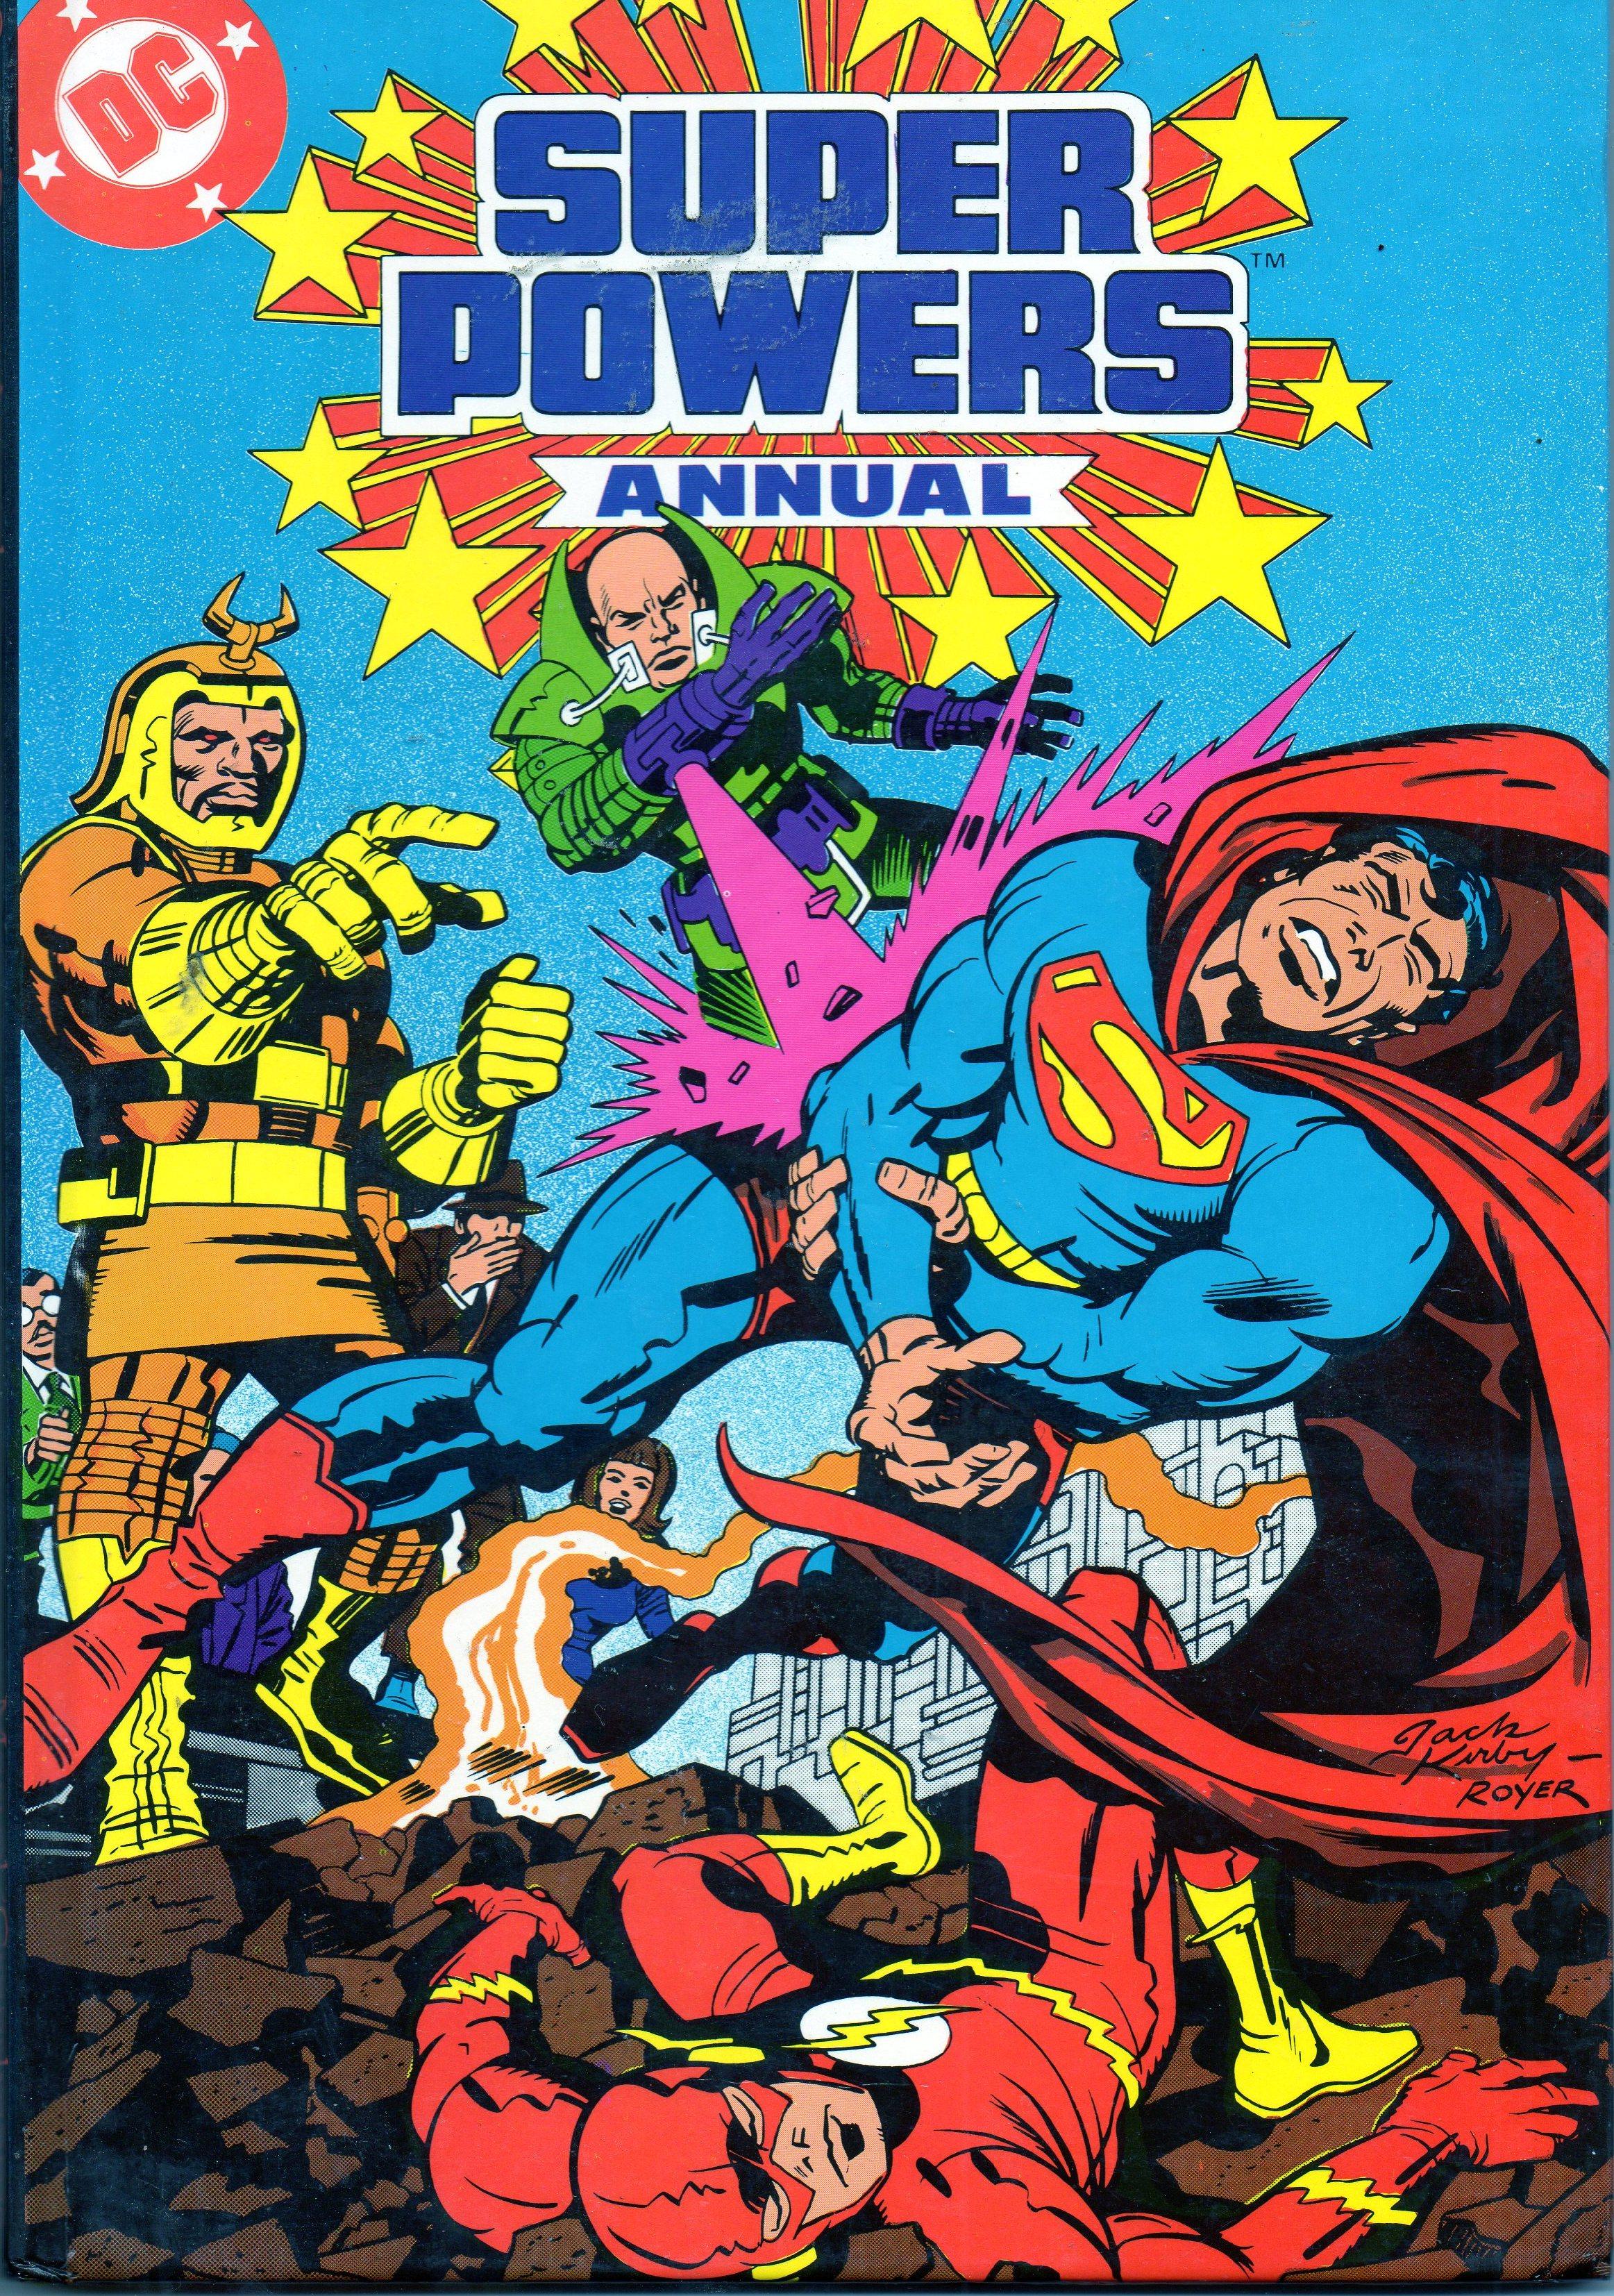 Super Powers Annual Vol 1 1